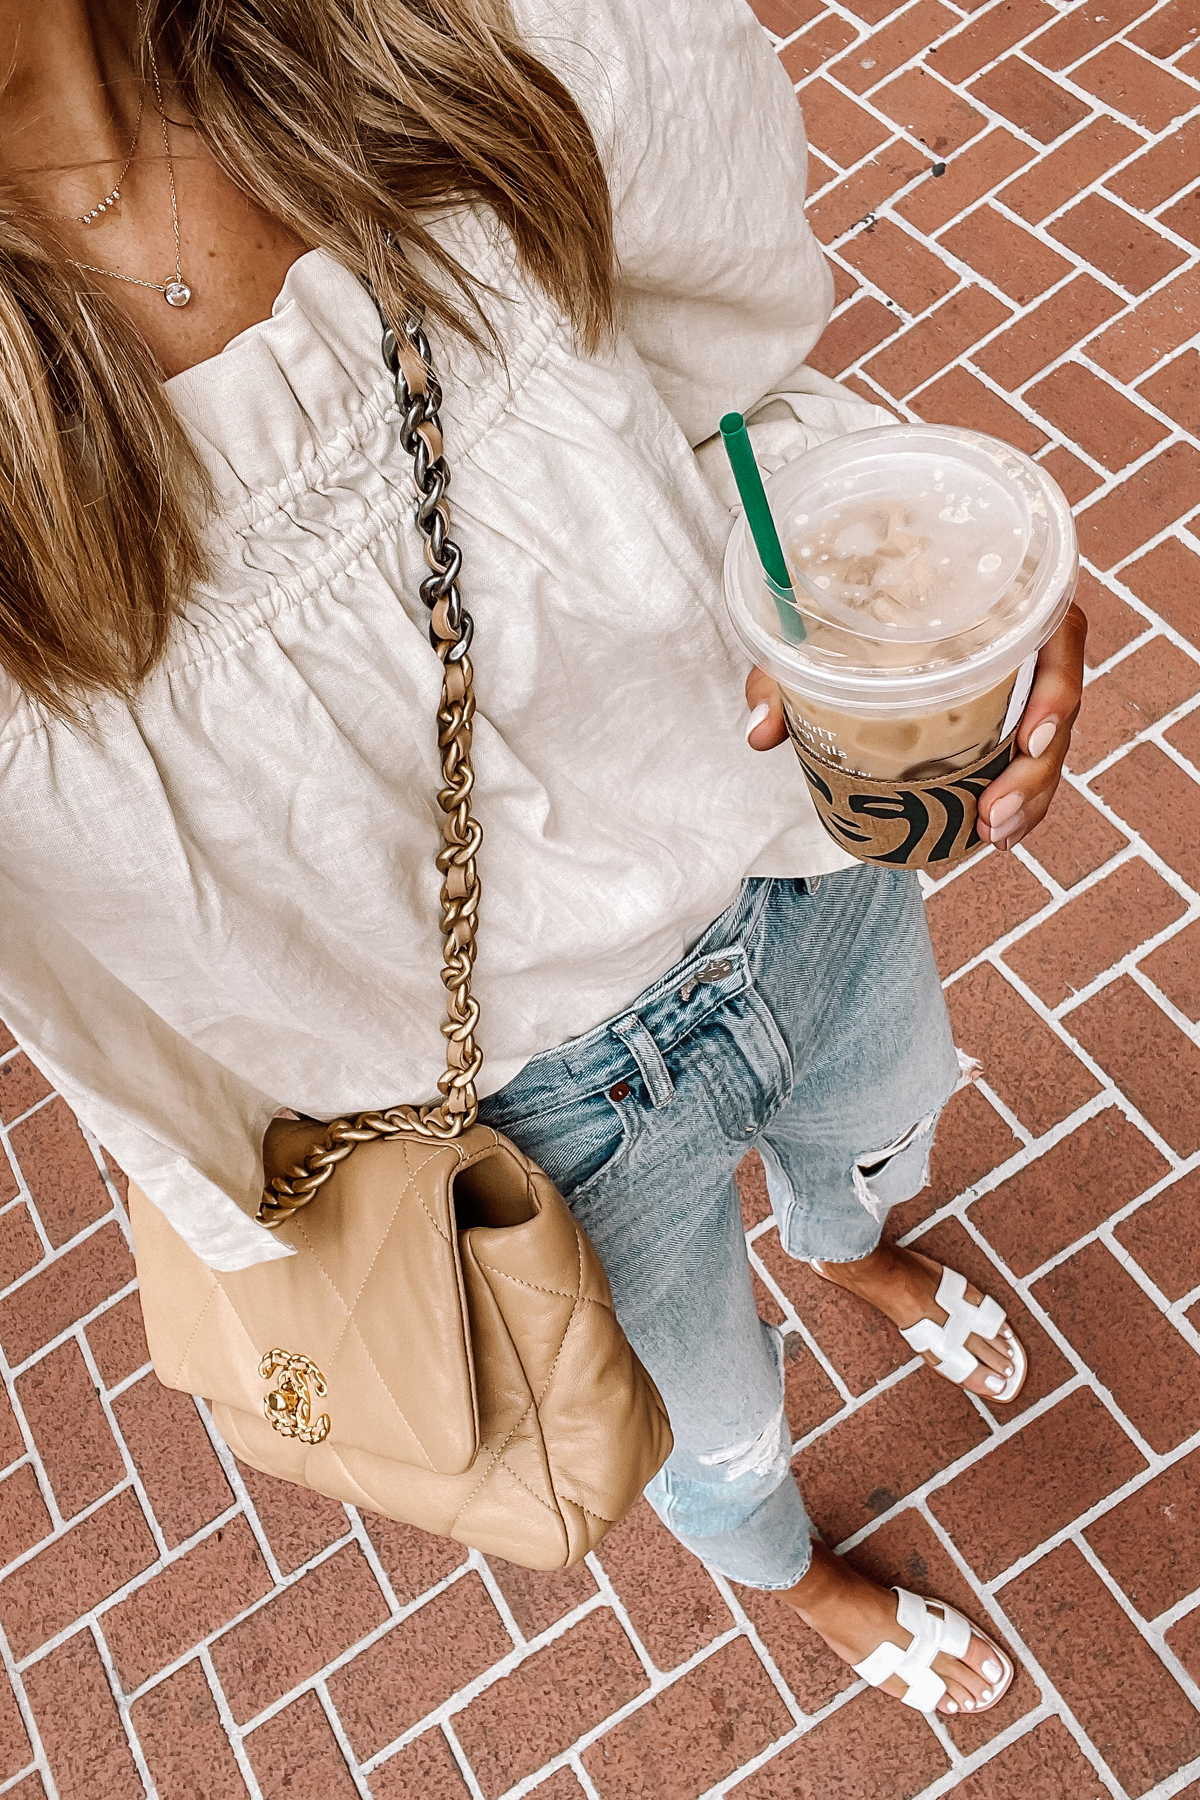 Fashion Jackson Wearing Beige Linen Puff Sleeve Top Madewell Ripped Jeans Hermes White Sandals Chanel 19 Beige Handbag 3